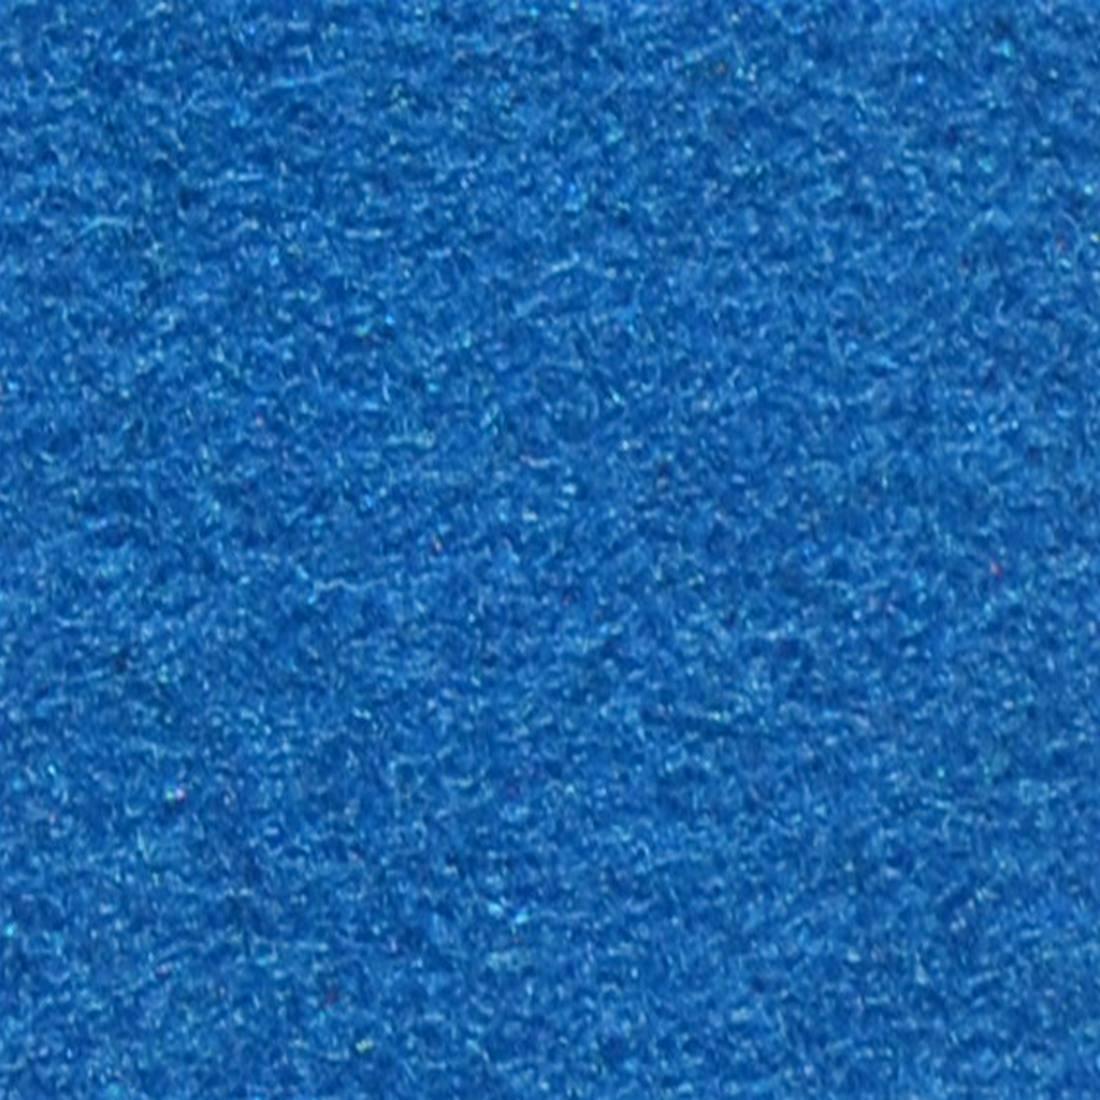 Cut Pool Billiard Table Replacement PREMIER Cloth Felt Fabric - Electric blue pool table